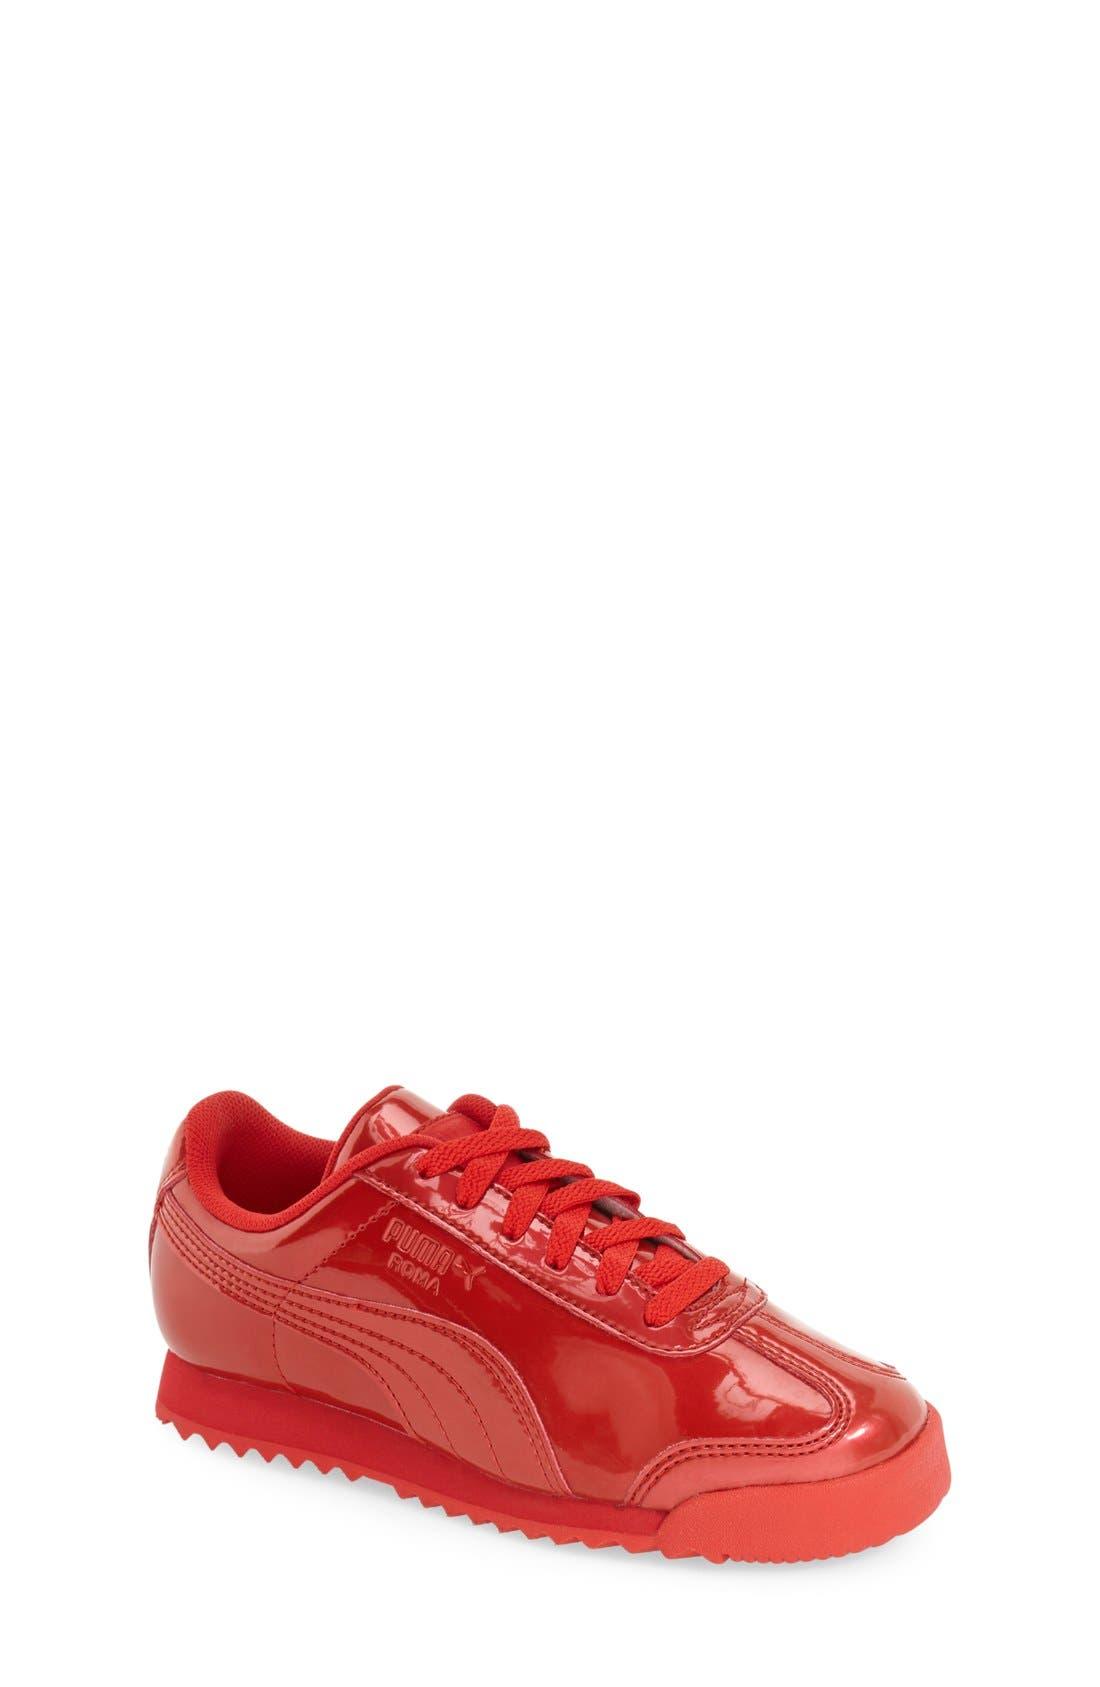 Alternate Image 1 Selected - PUMA 'Roma' Sneaker (Toddler, Little Kid & Big Kid)